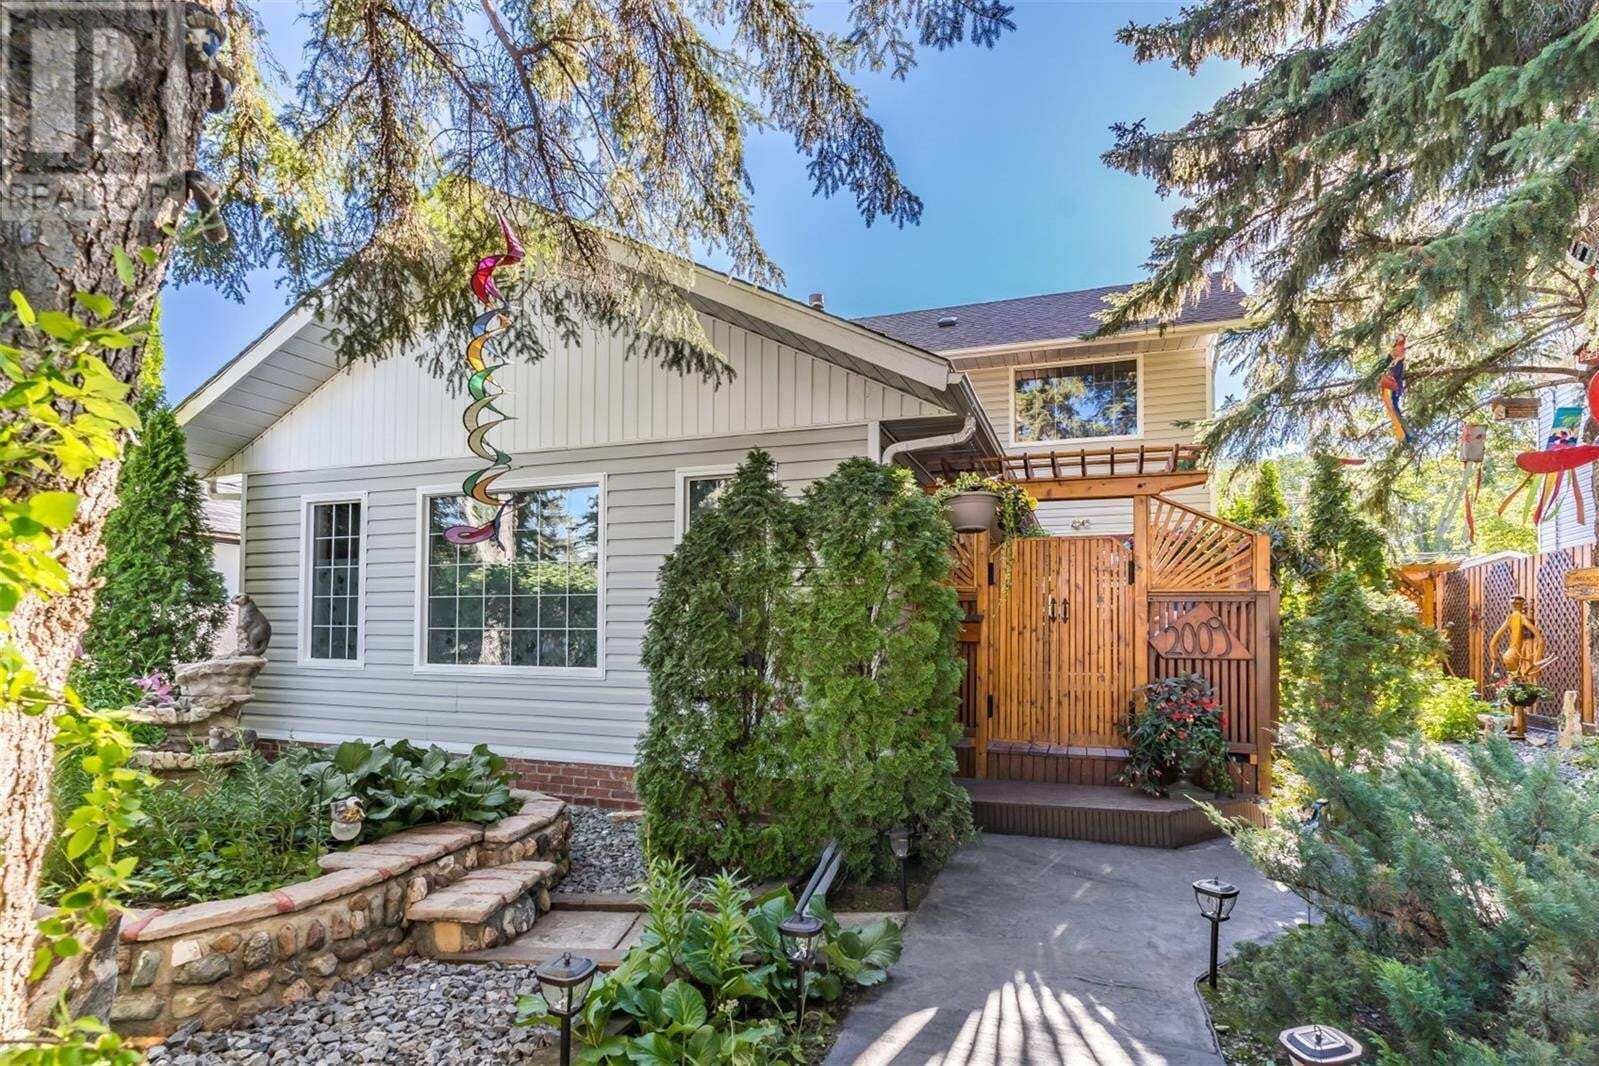 House for sale at 2009 Coy Ave Saskatoon Saskatchewan - MLS: SK827515